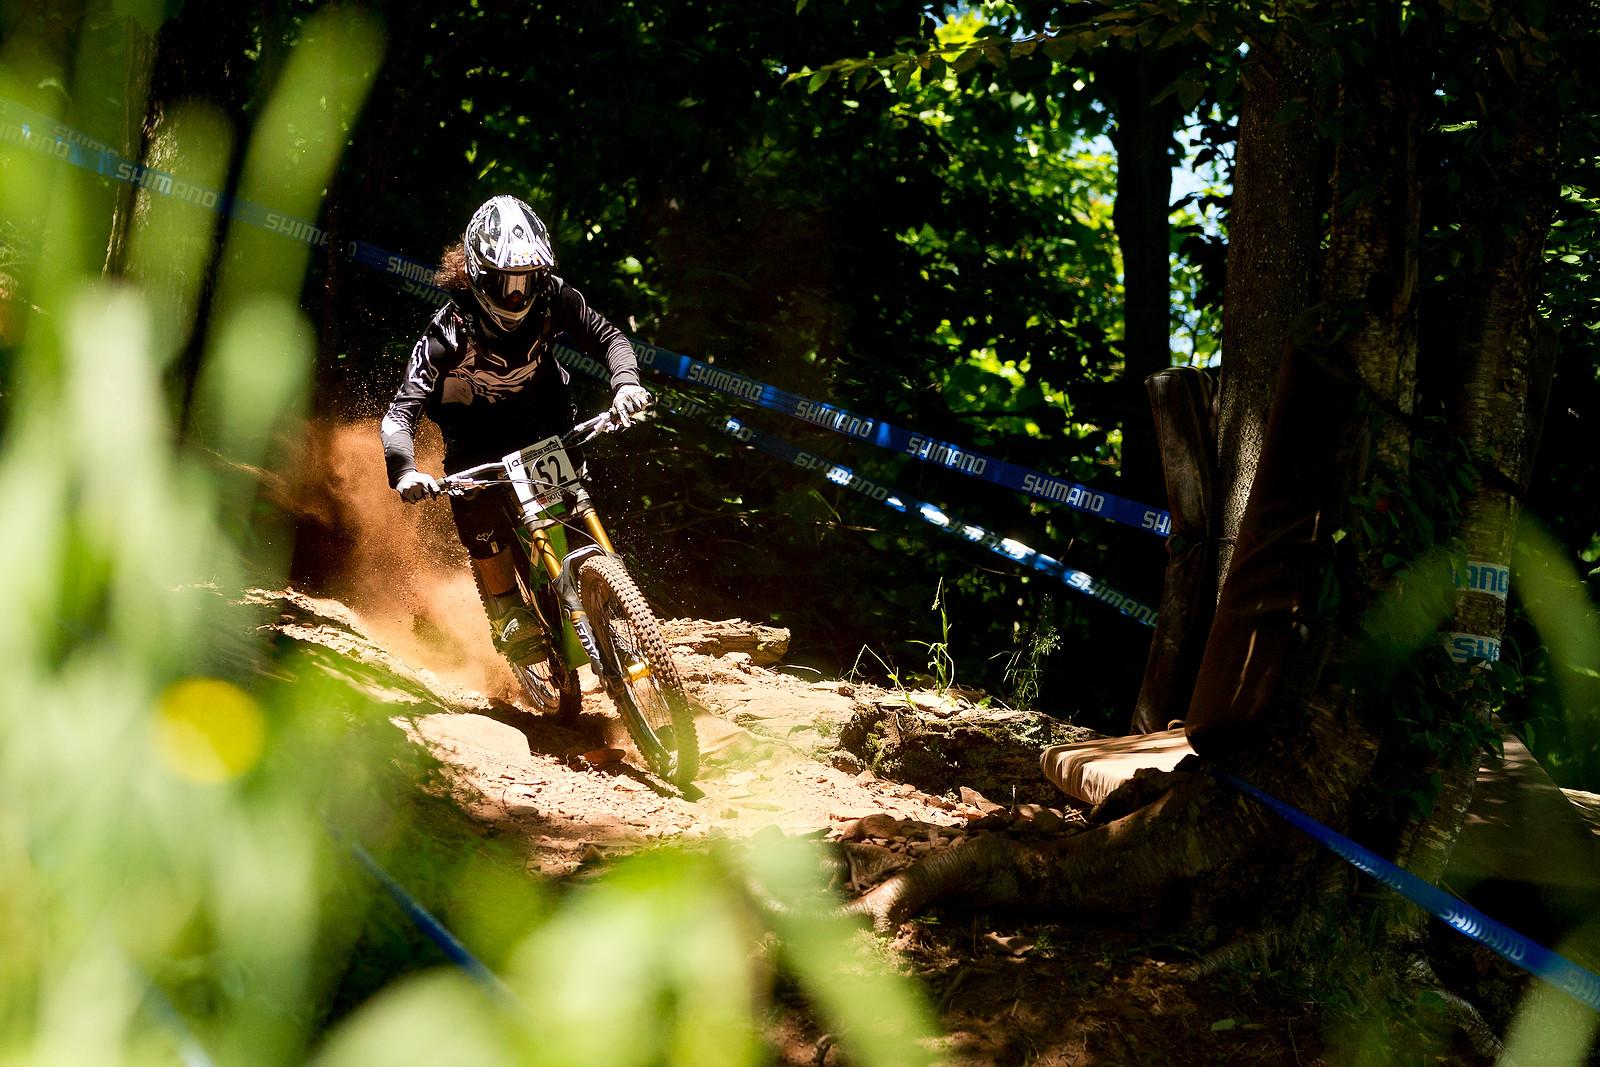 Yuki Kushima at Windham World Cup - 2012 UCI World Cup, Windham, New York Day 2 - Mountain Biking Pictures - Vital MTB